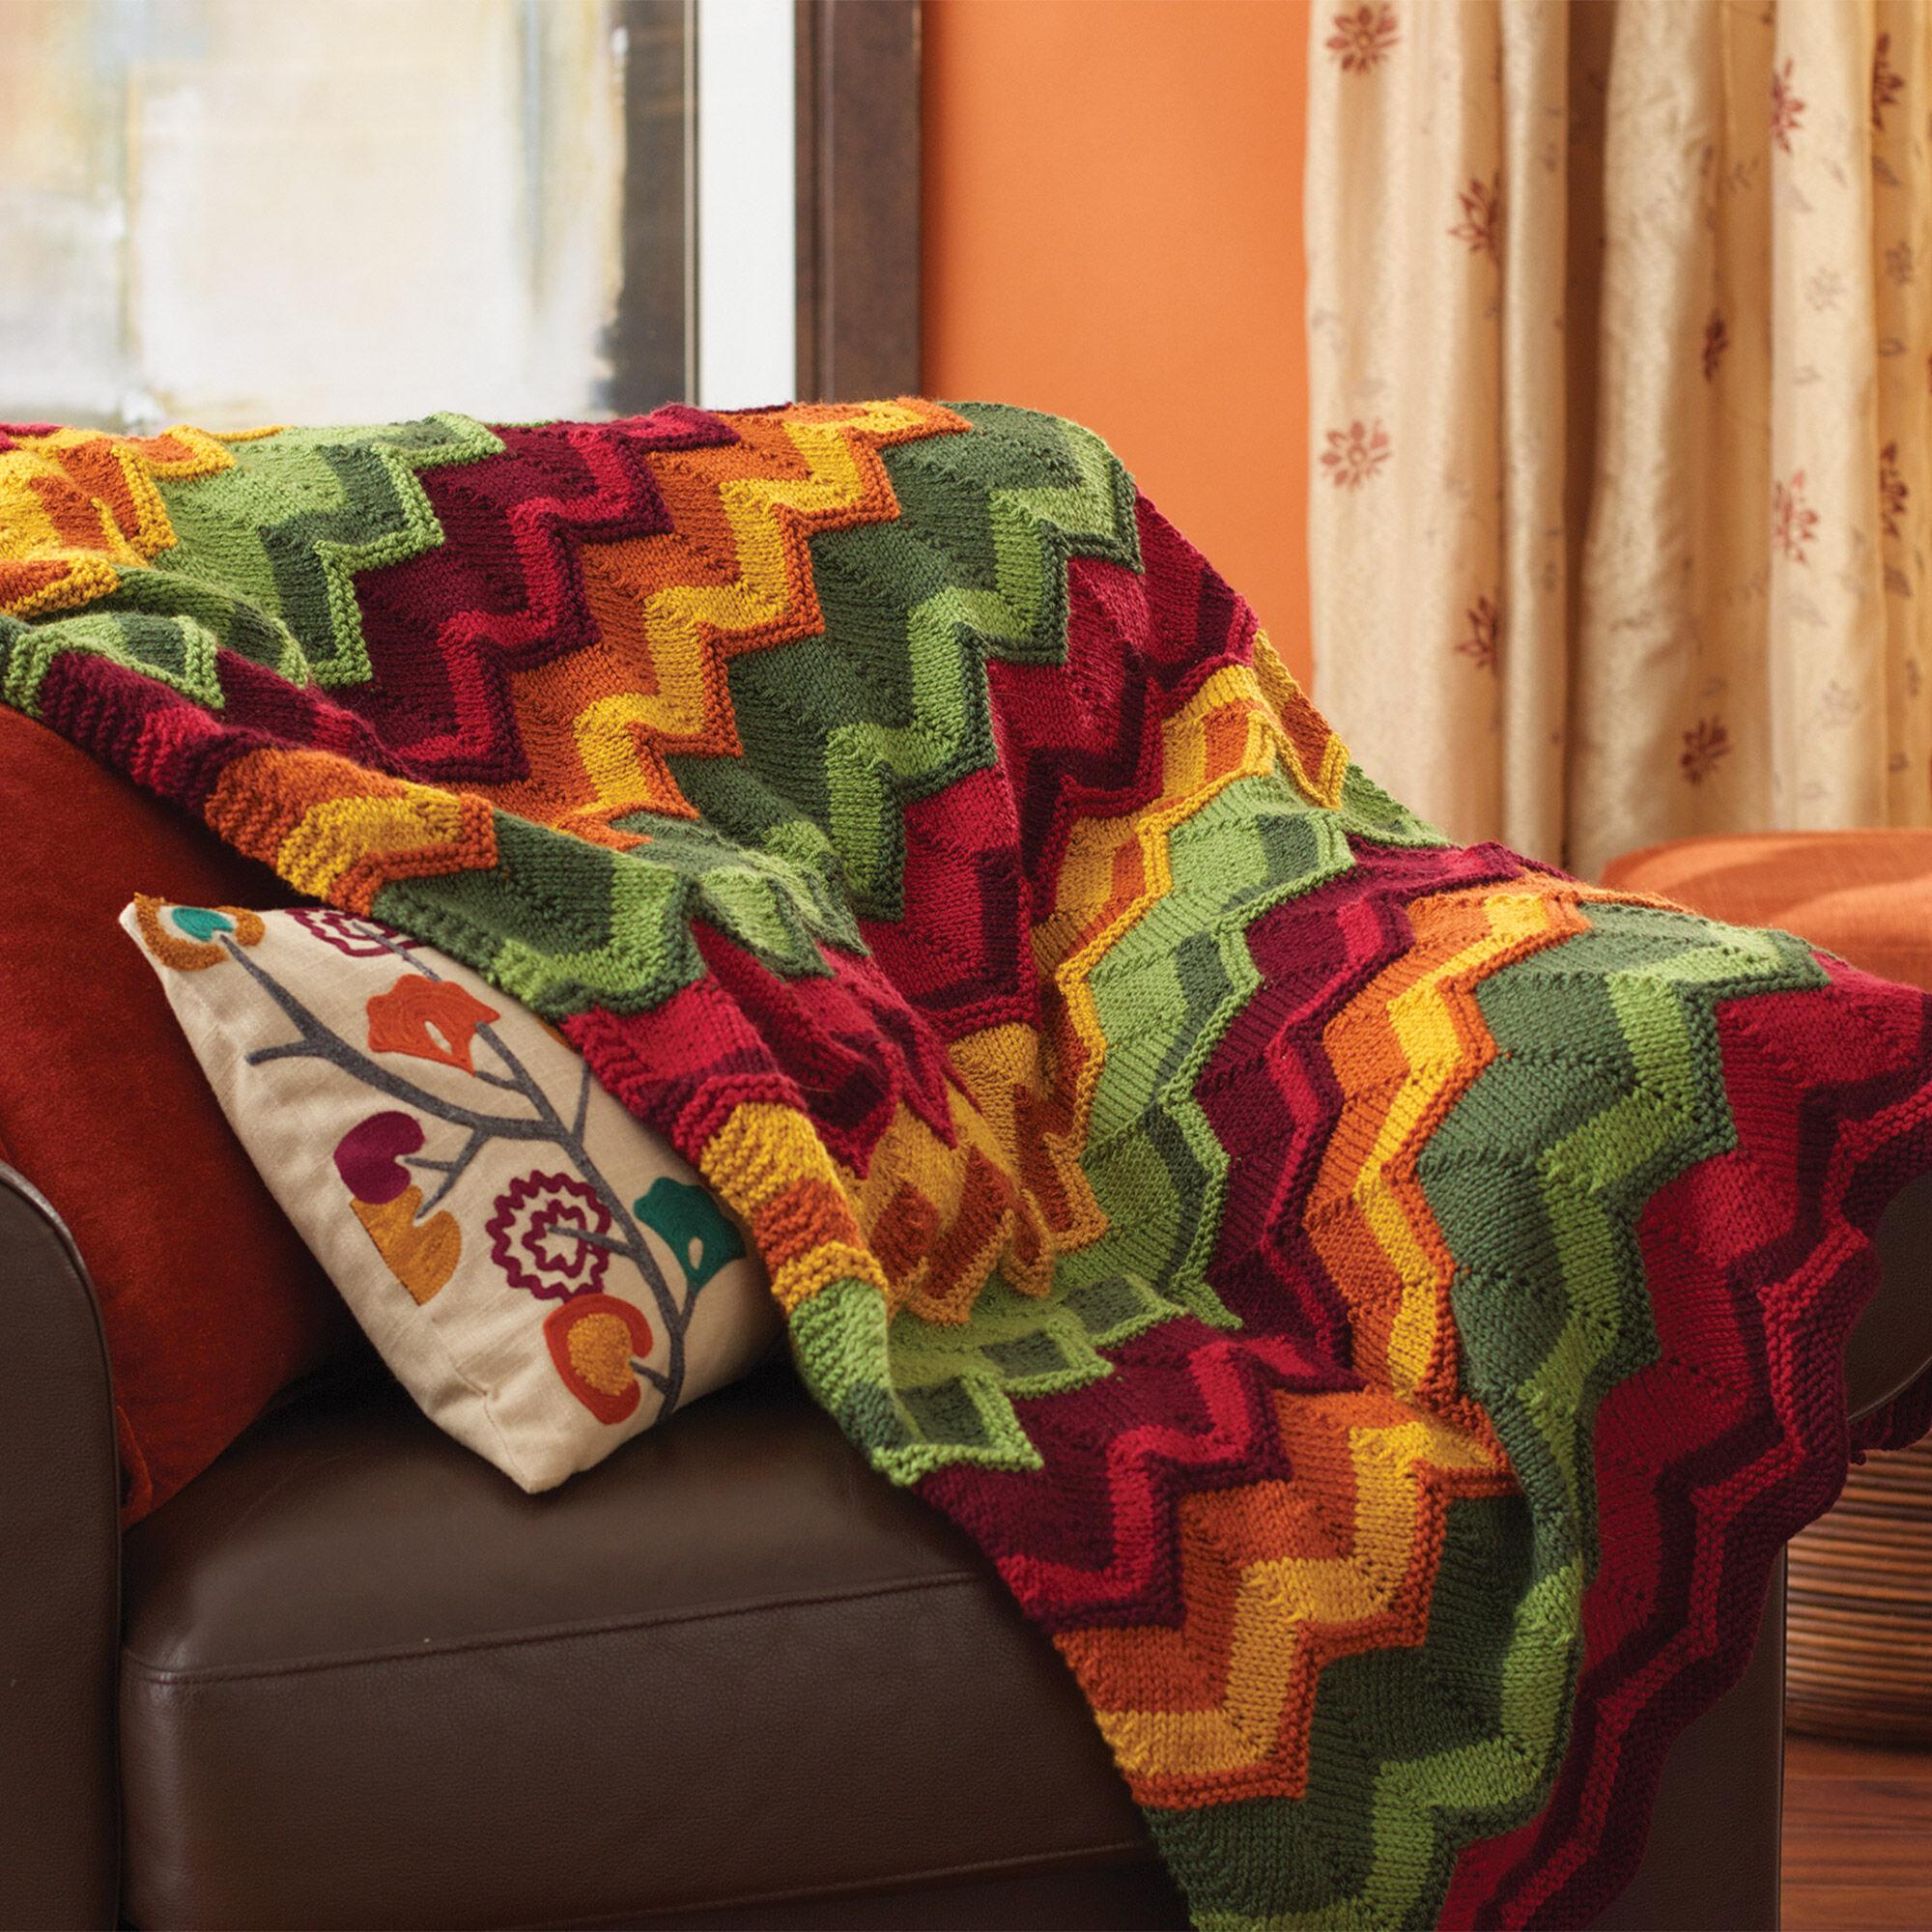 Patons Spicy Chevron Blanket Yarnspirations